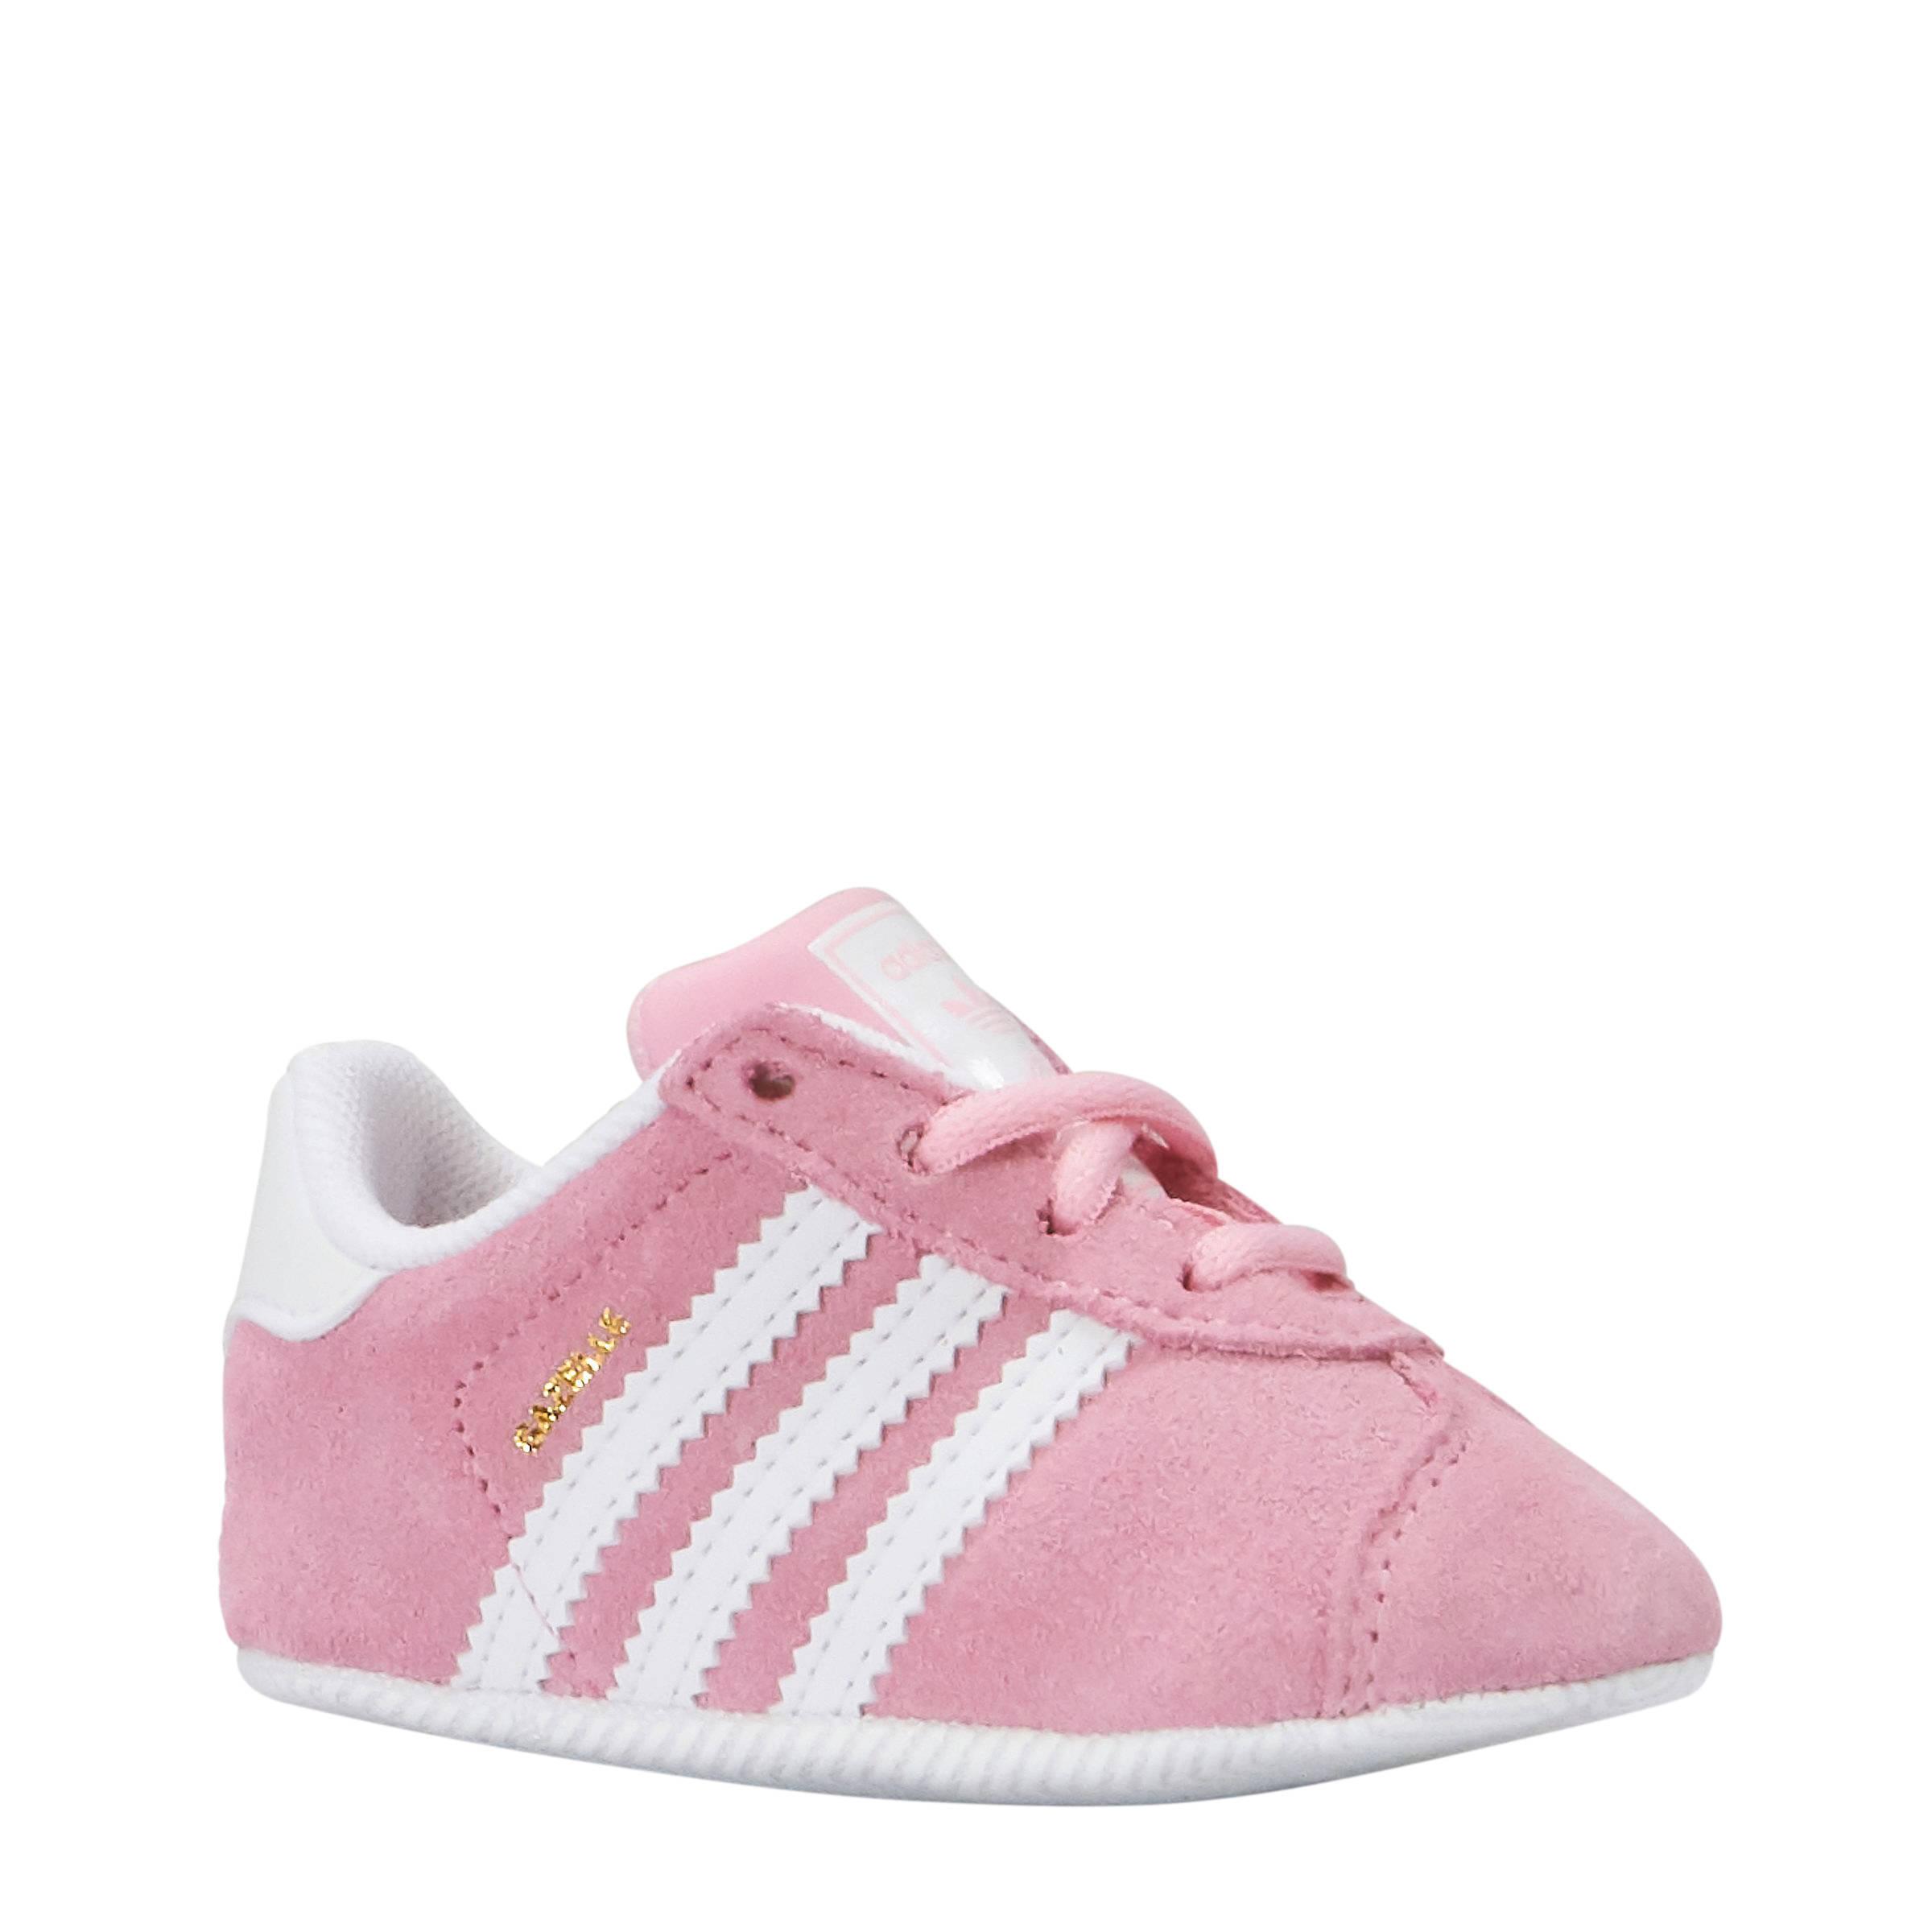 adidas extaball w schoenen wit bordeaux rood